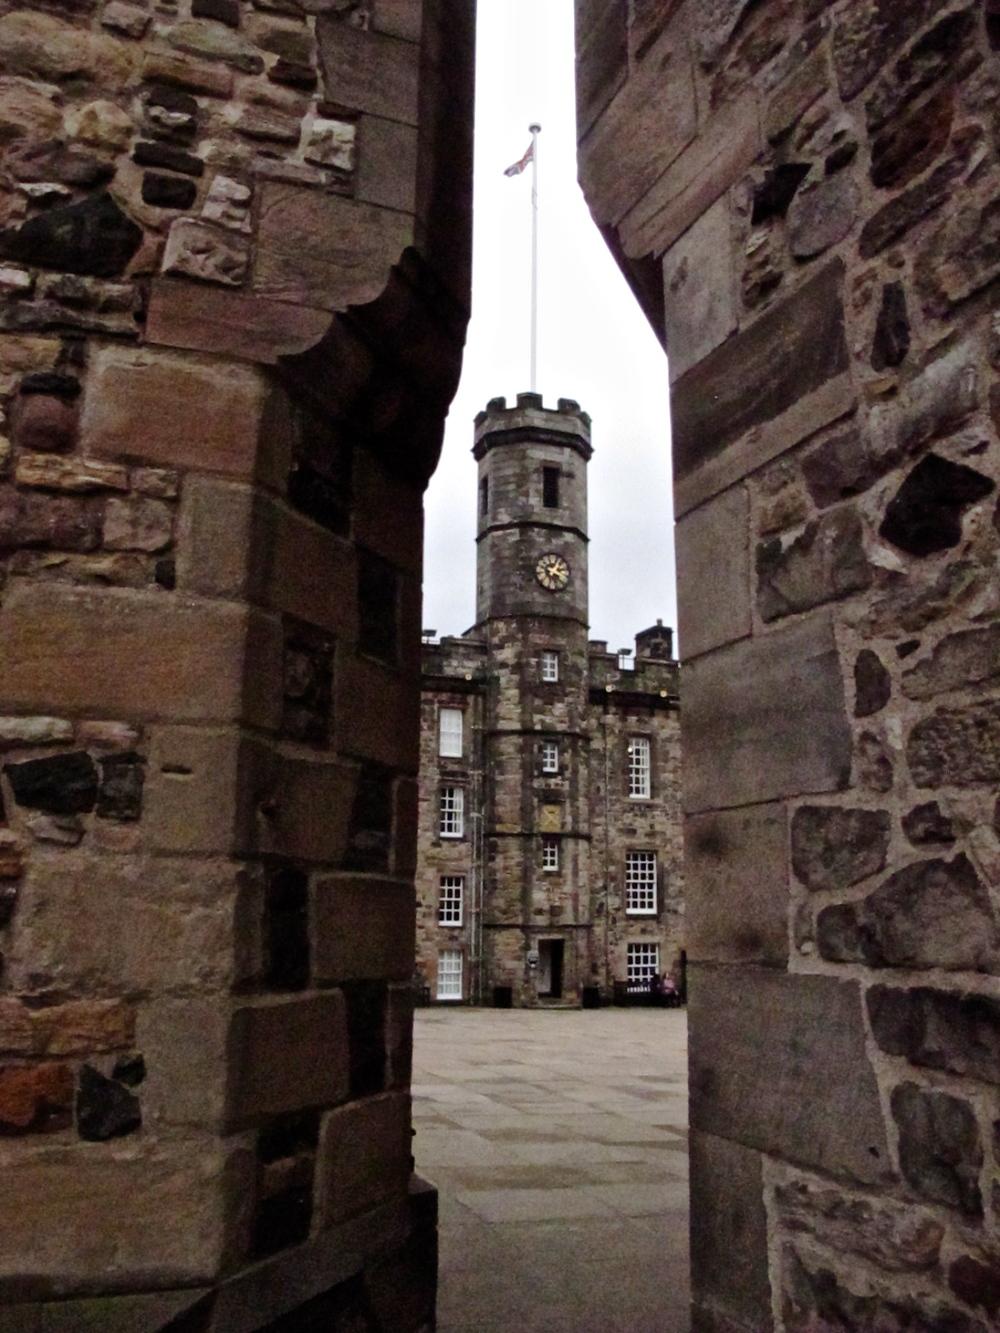 Tower seen through a walkway, Edinburgh Castle.